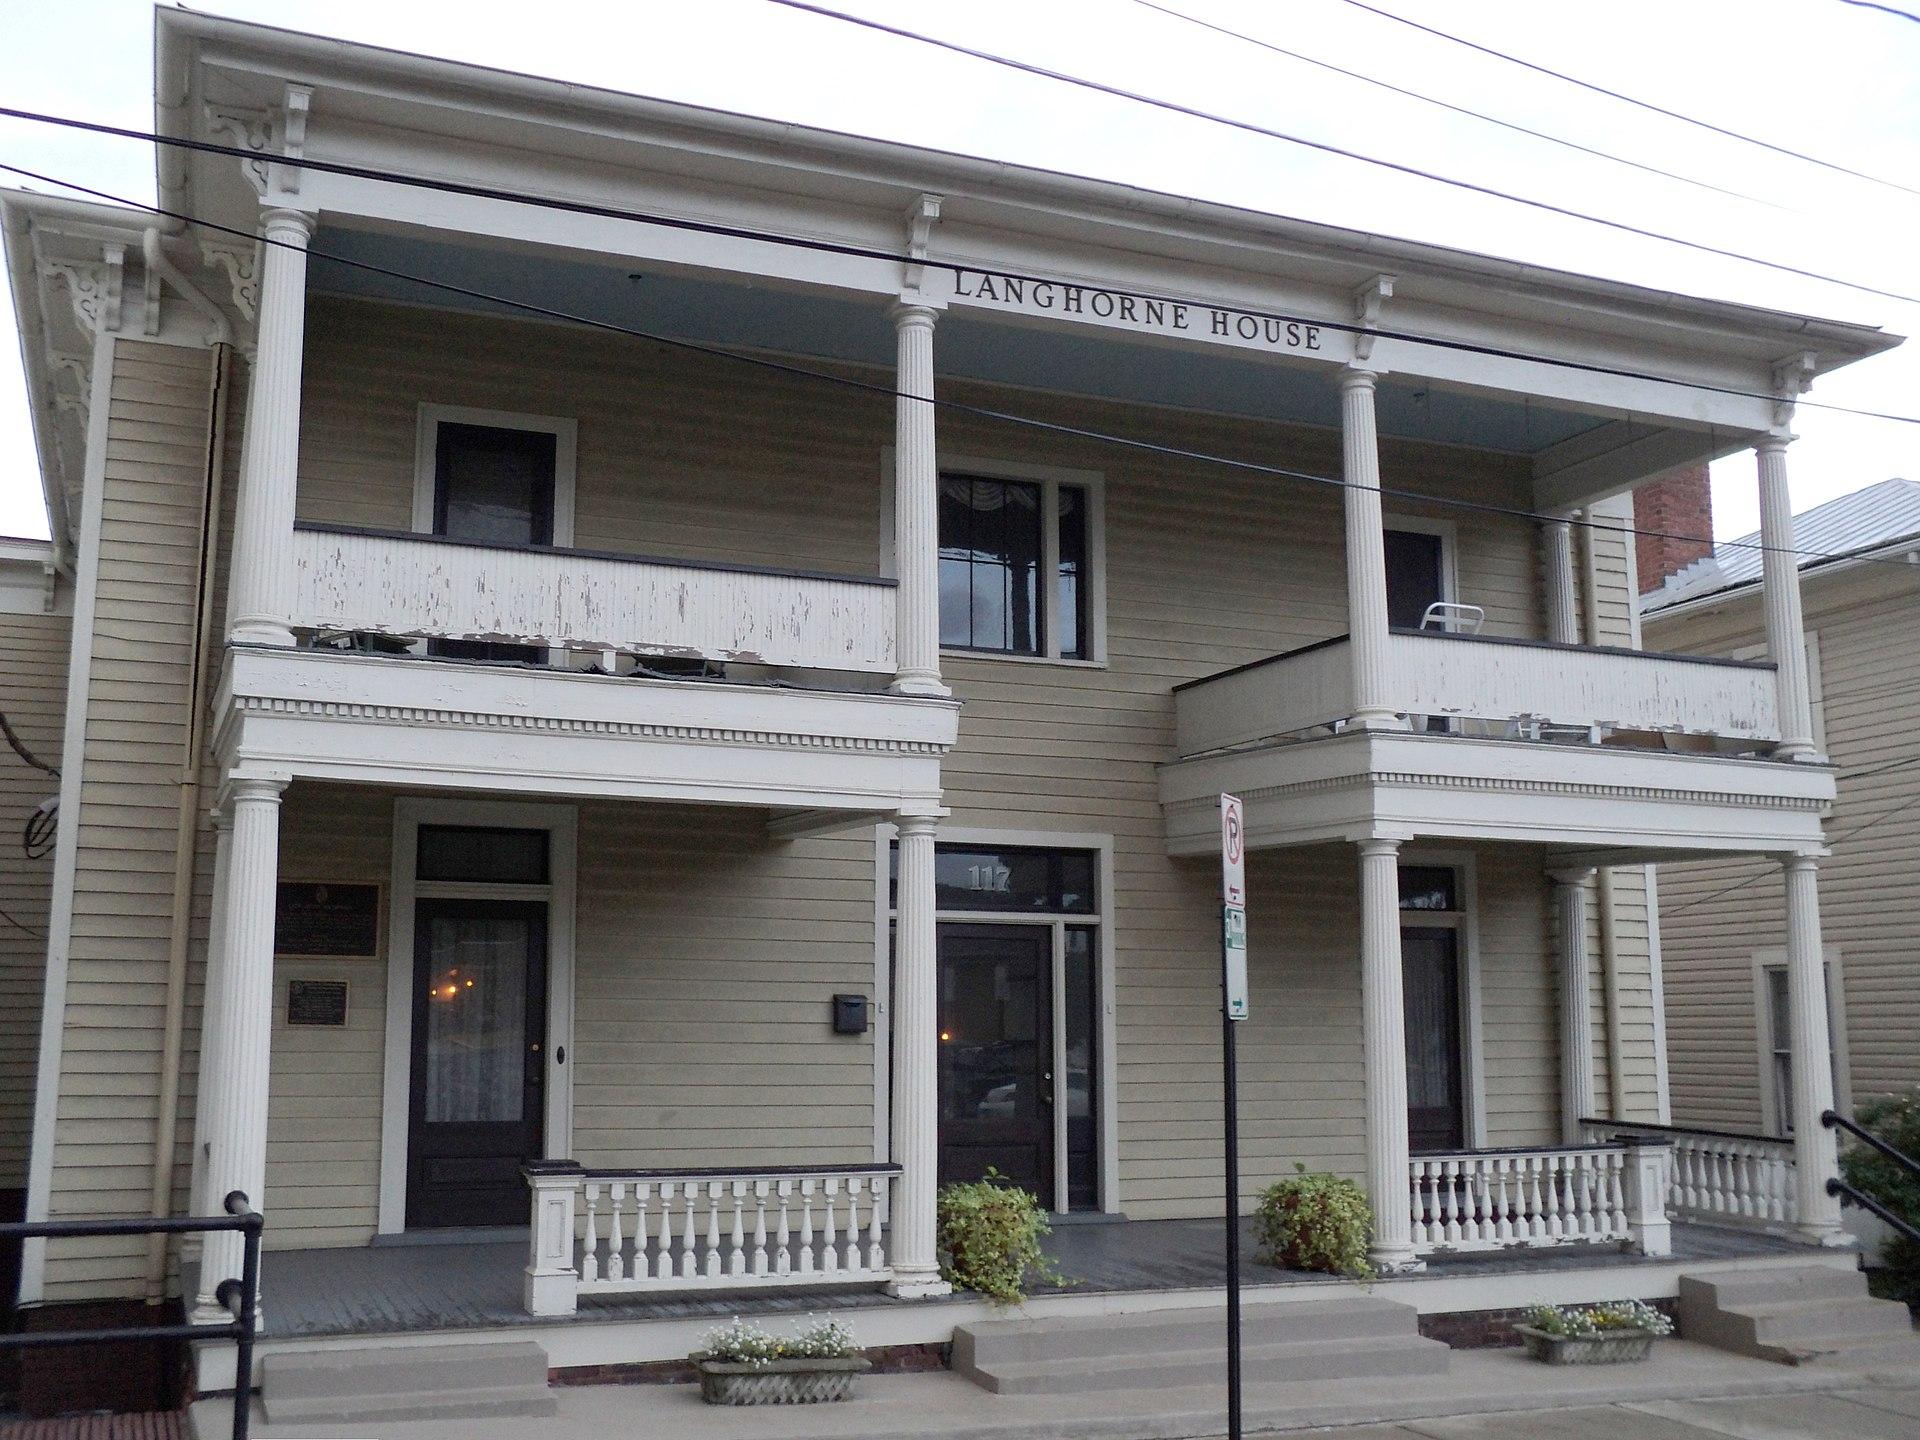 Nancy's childhood home, the Langhorne House in Danville, Virginia.